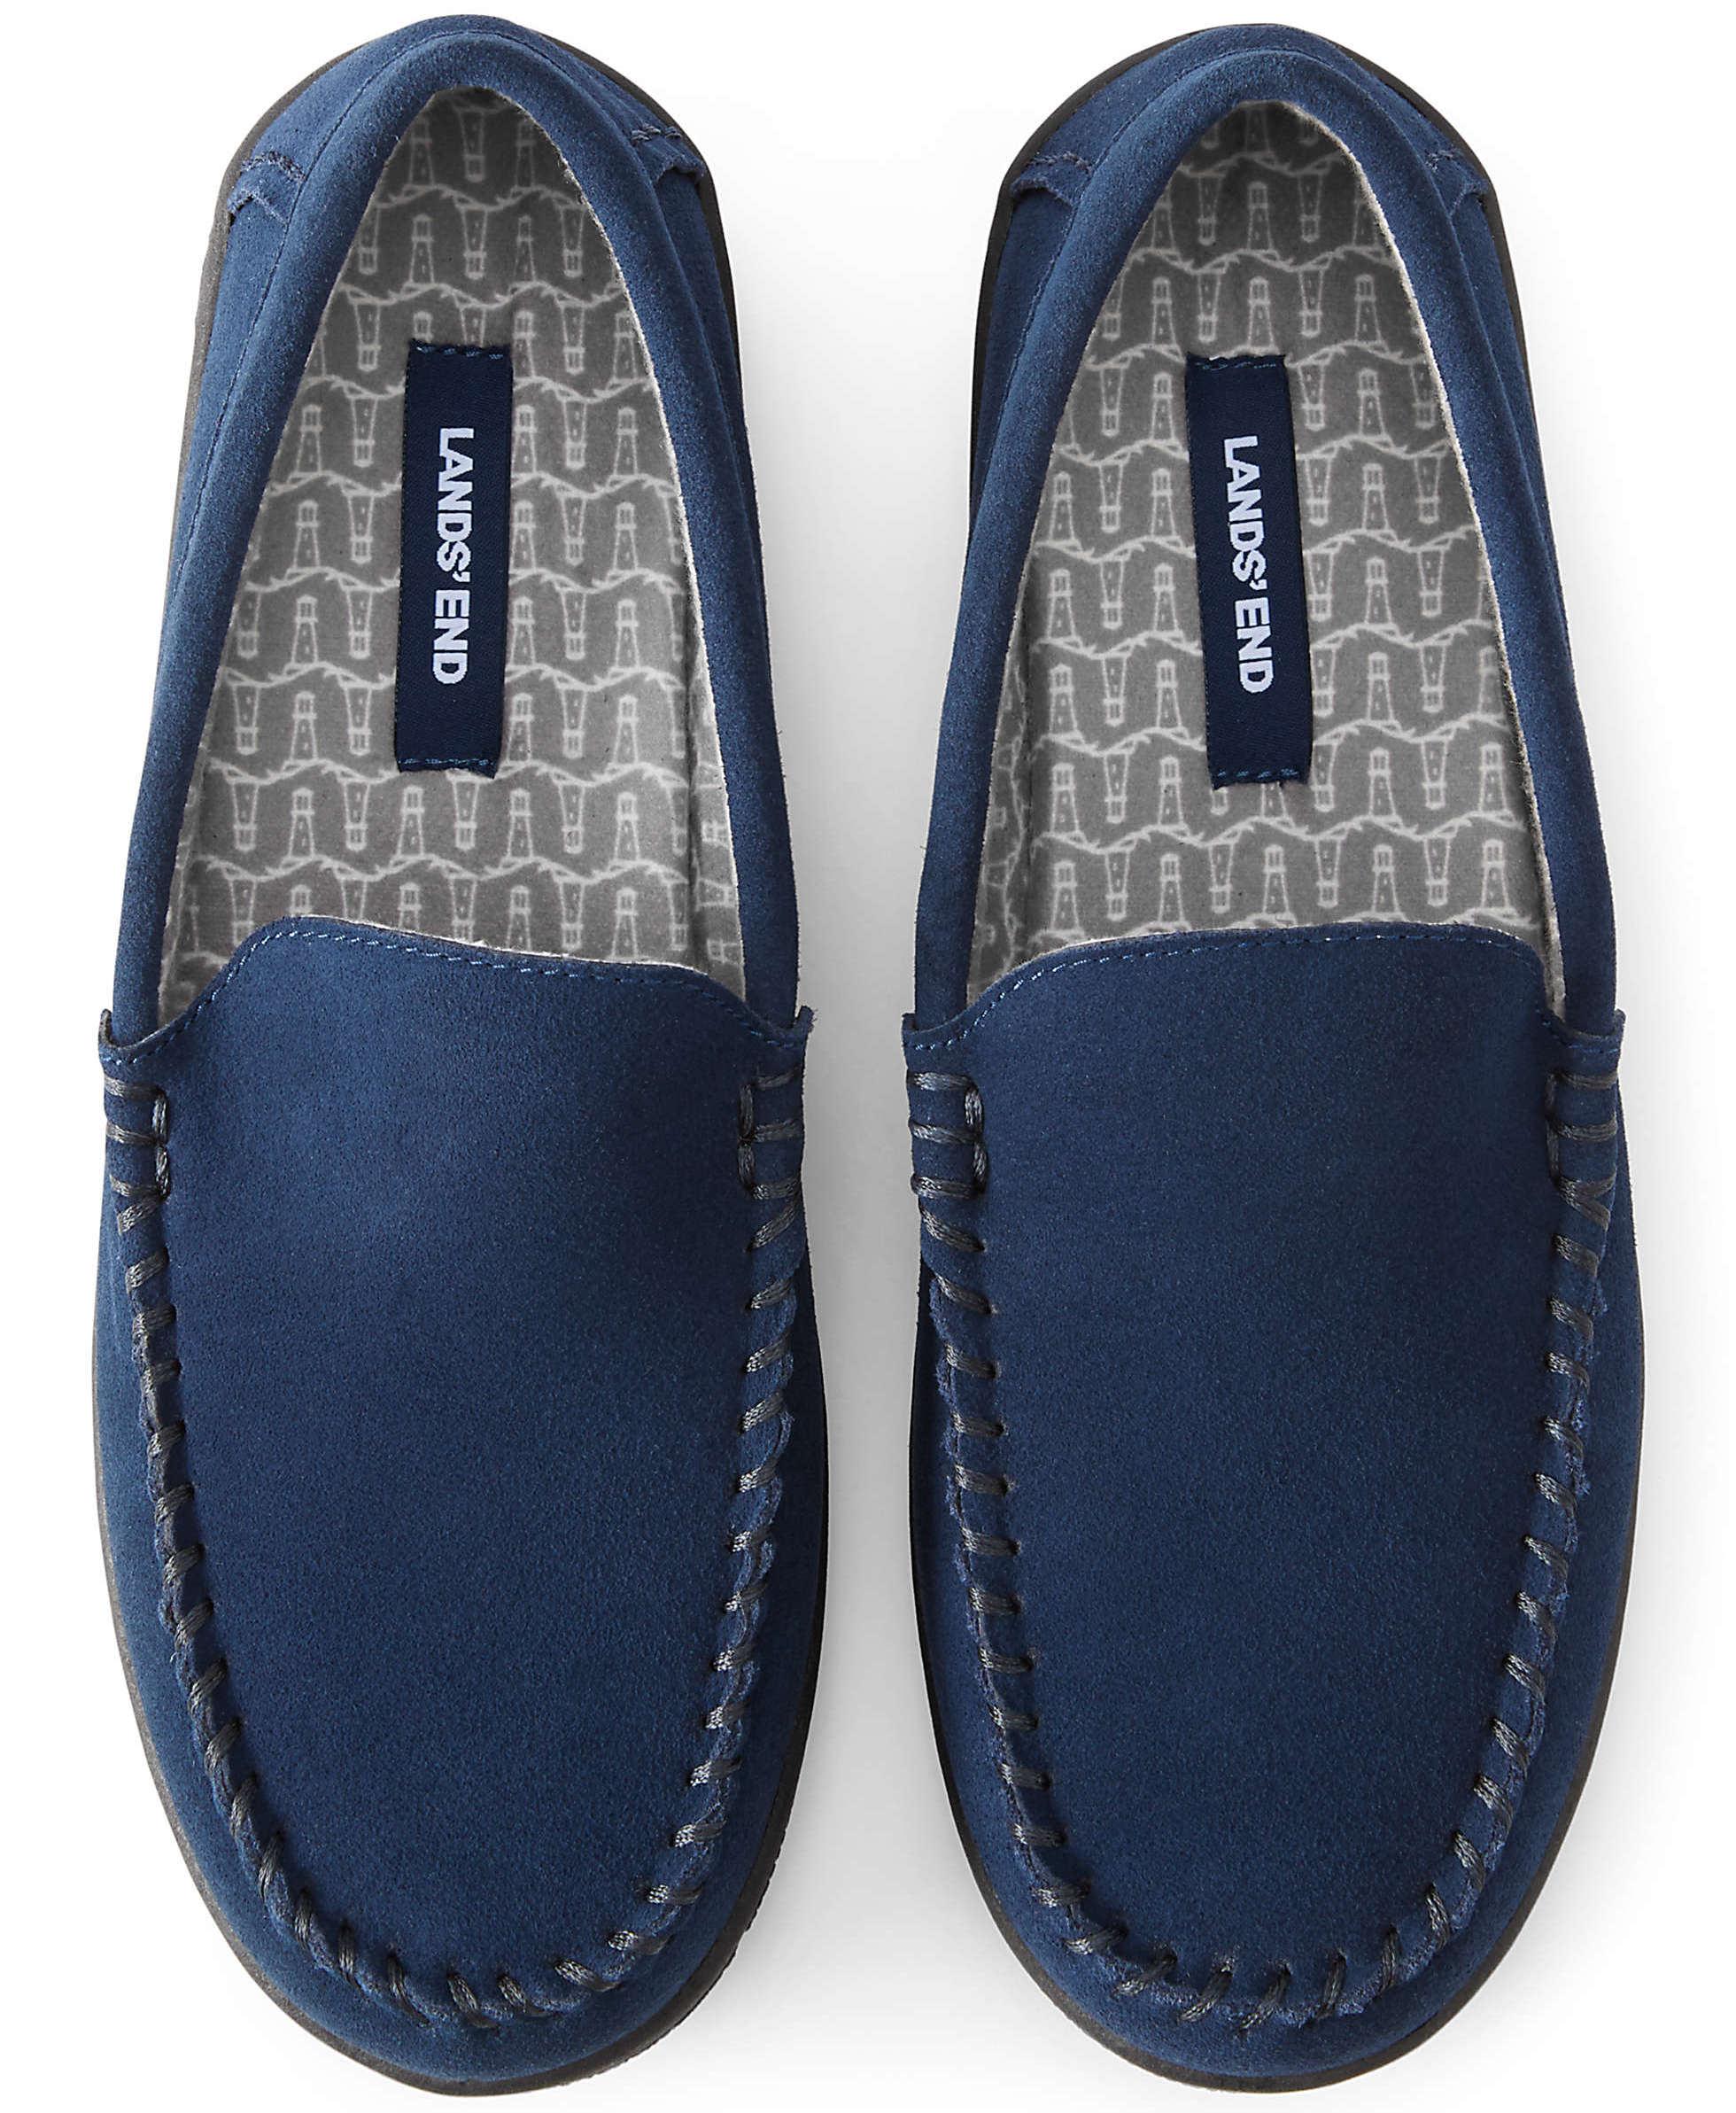 Lands' End Men's Suede Flannel Lined Moccasin Slippers